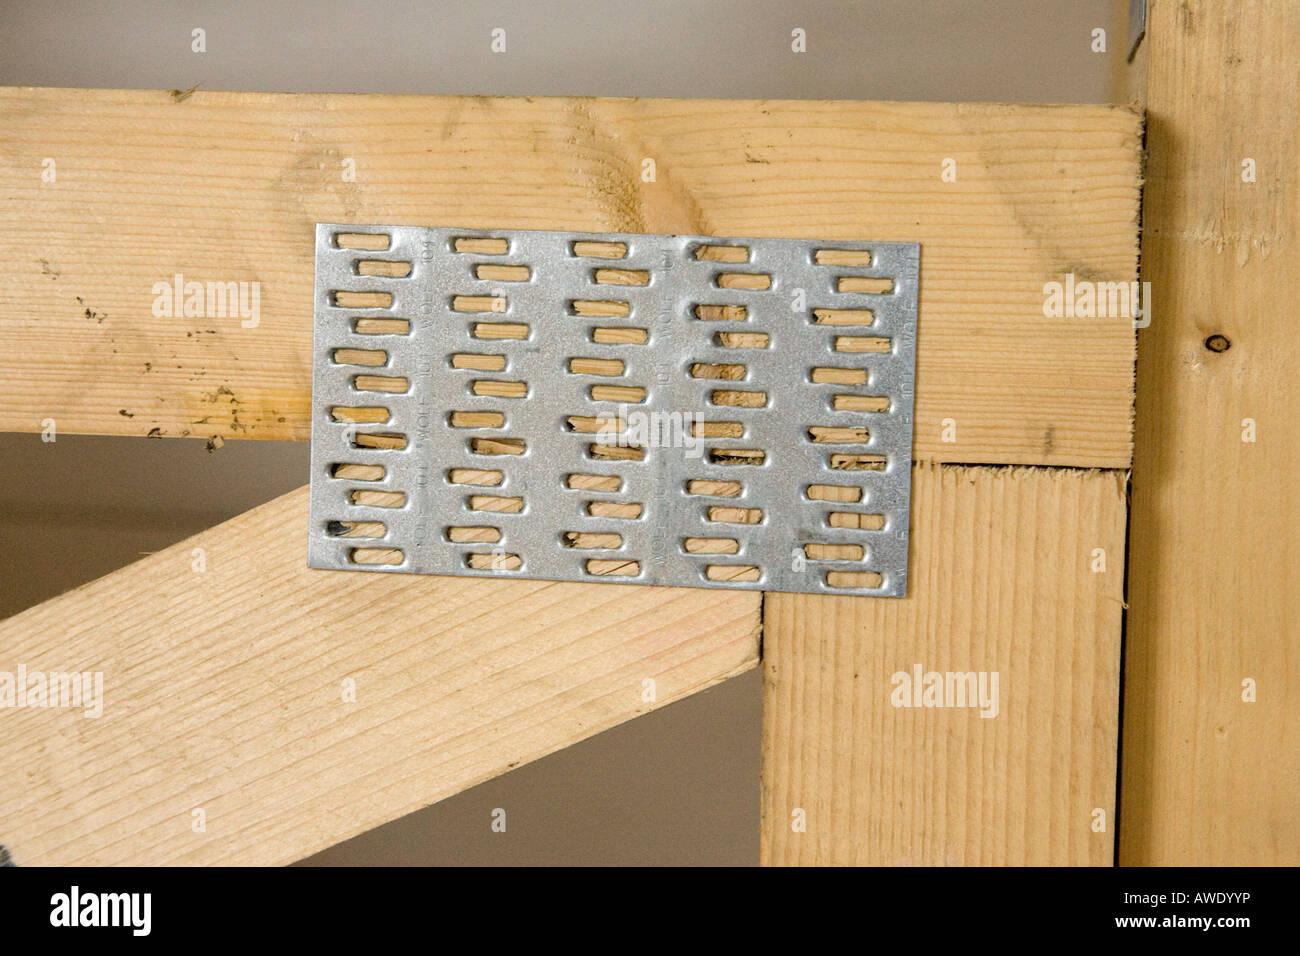 Gang Nail Plate Holding Timber Beams Together Stock Photo